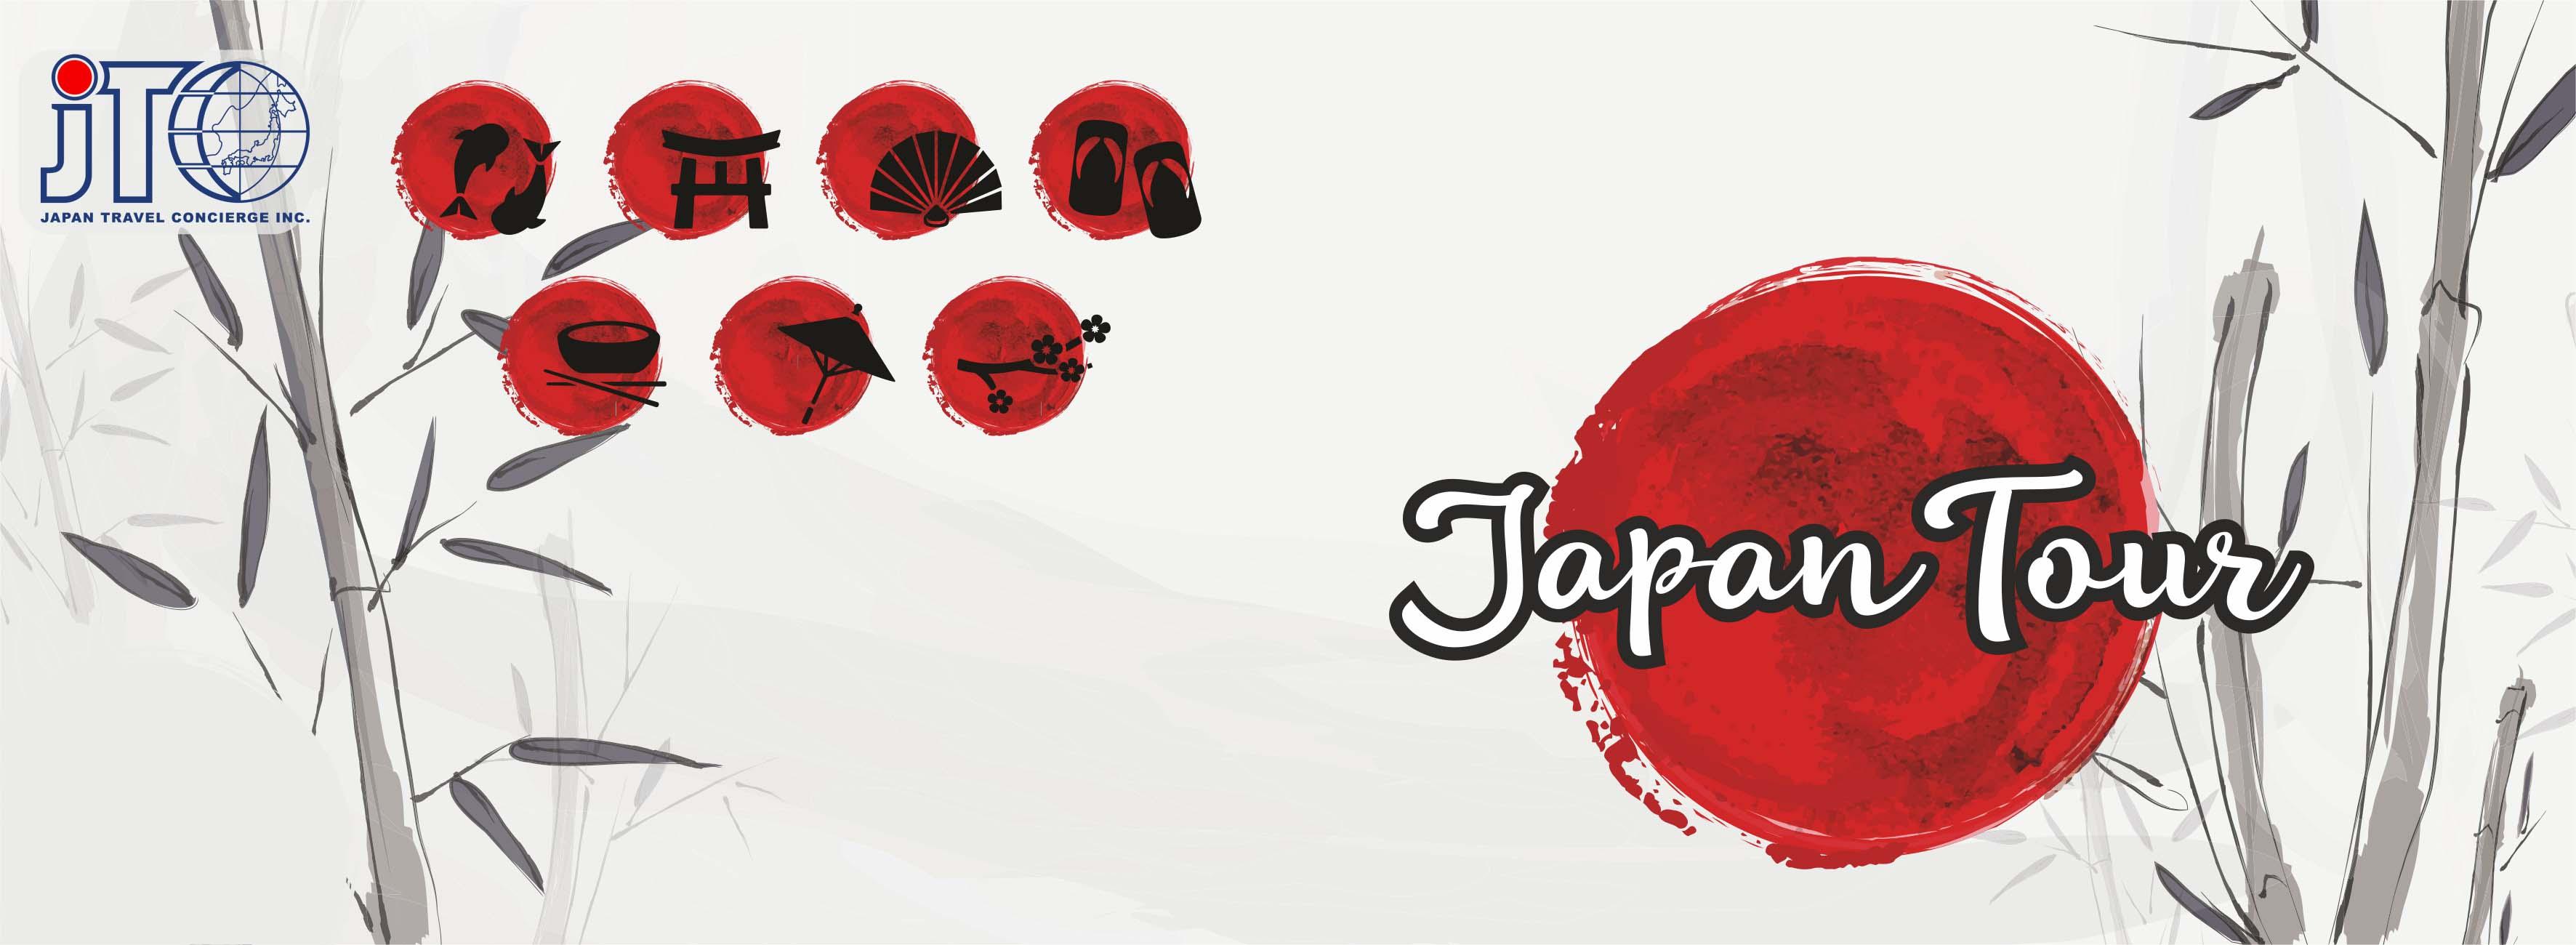 Обложки в соц. сети для тур. оператора по Японии фото f_87059b8424f1f110.jpg